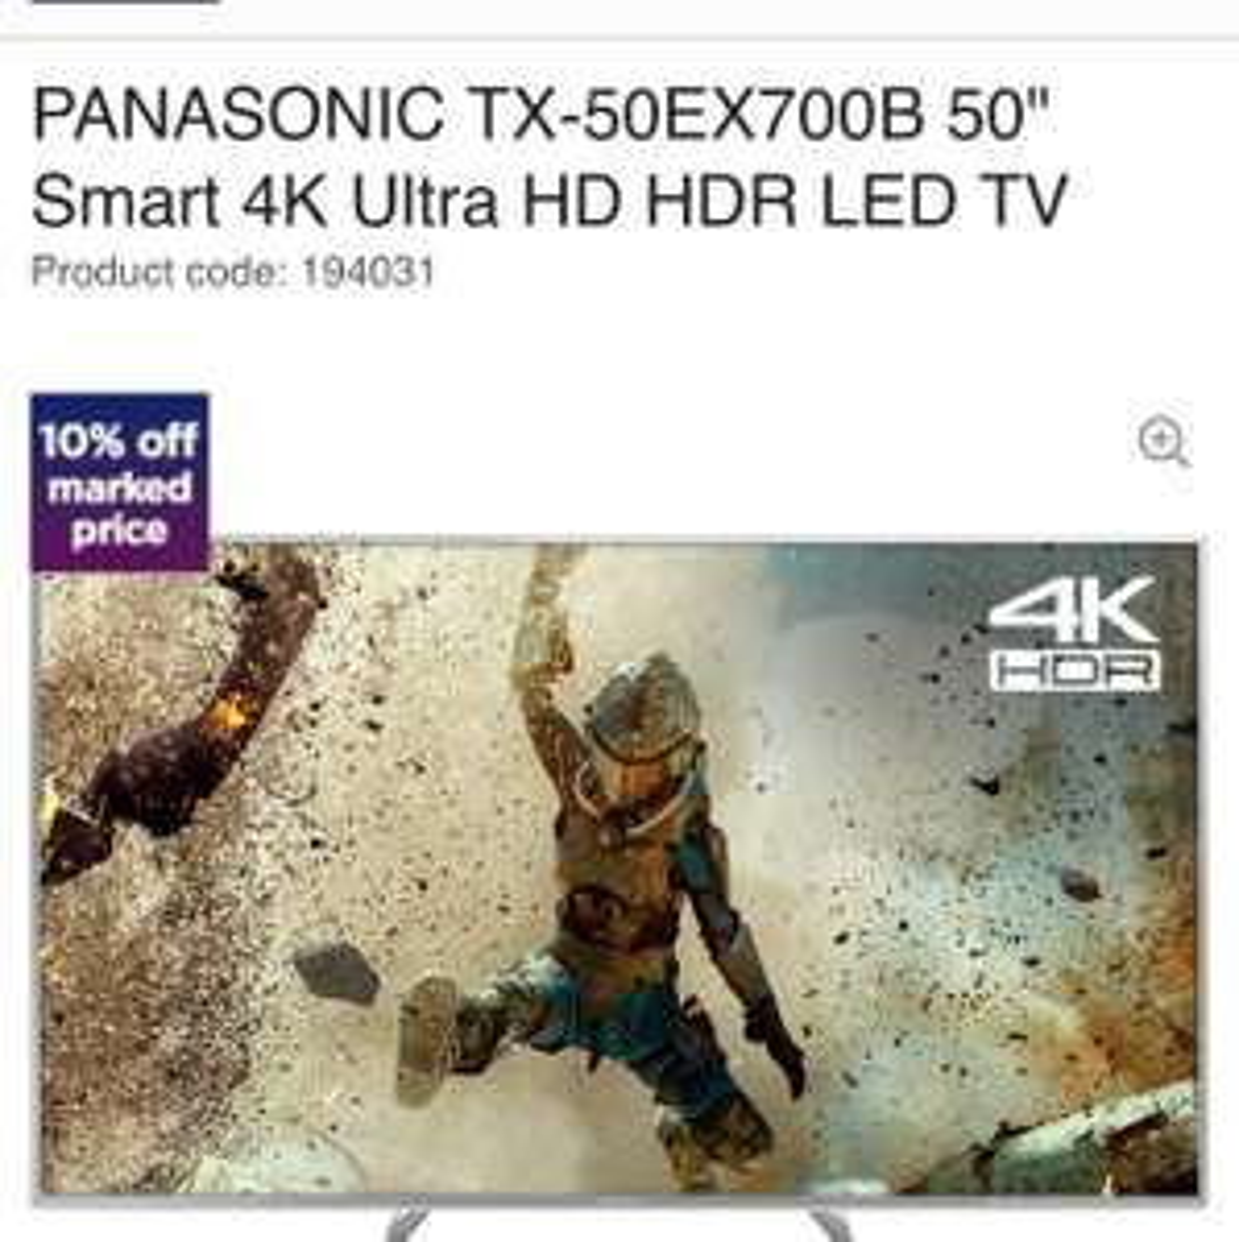 "PANASONIC TX-50EX700B 50"" Smart 4K Ultra HD HDR LED TV £584 @ Currys"